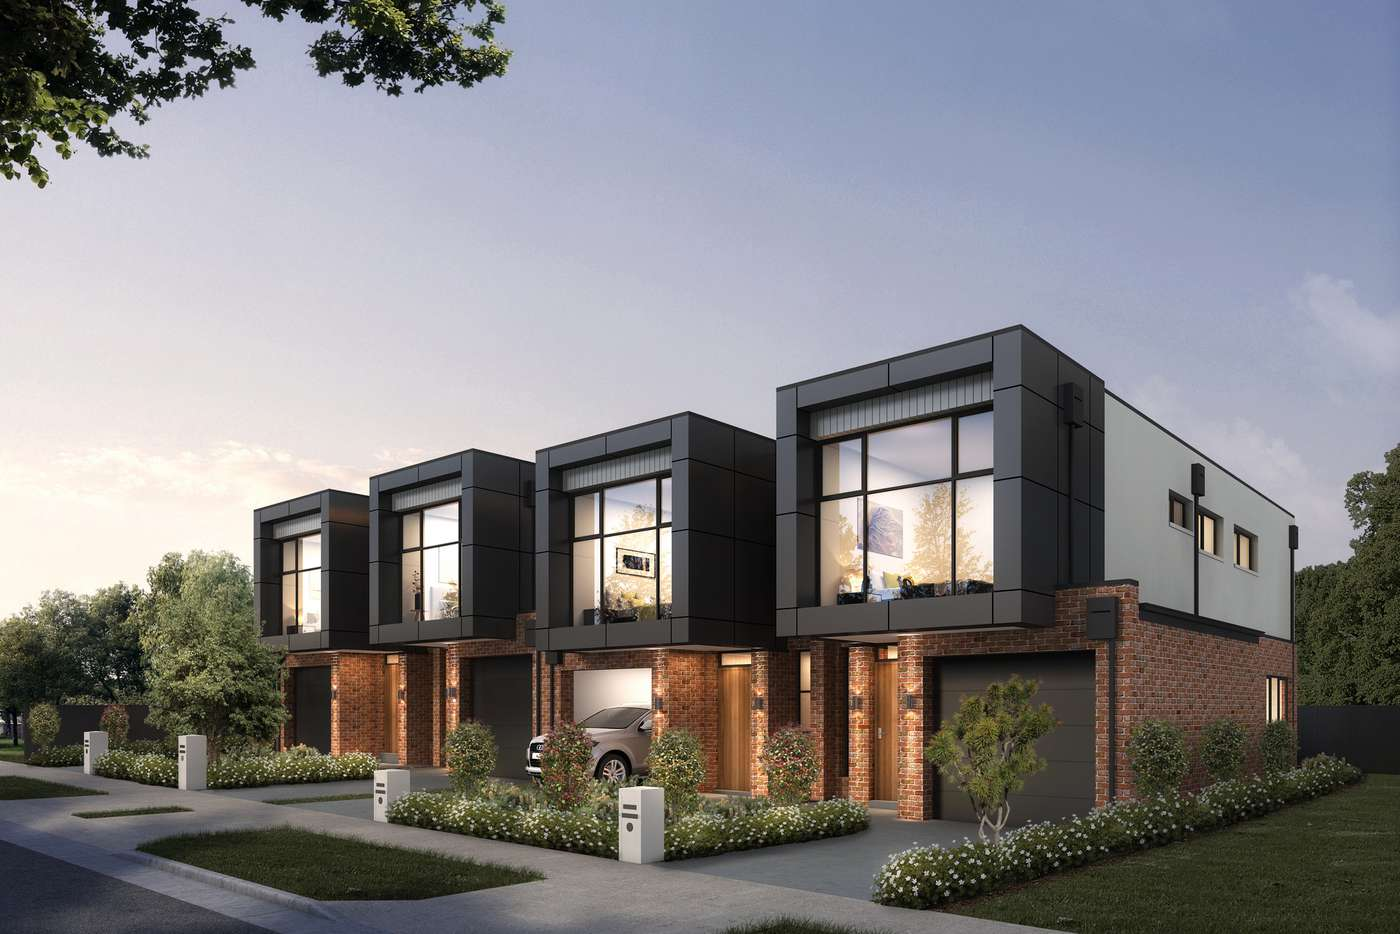 Main view of Homely house listing, 9 Whites Lane, Newton SA 5074